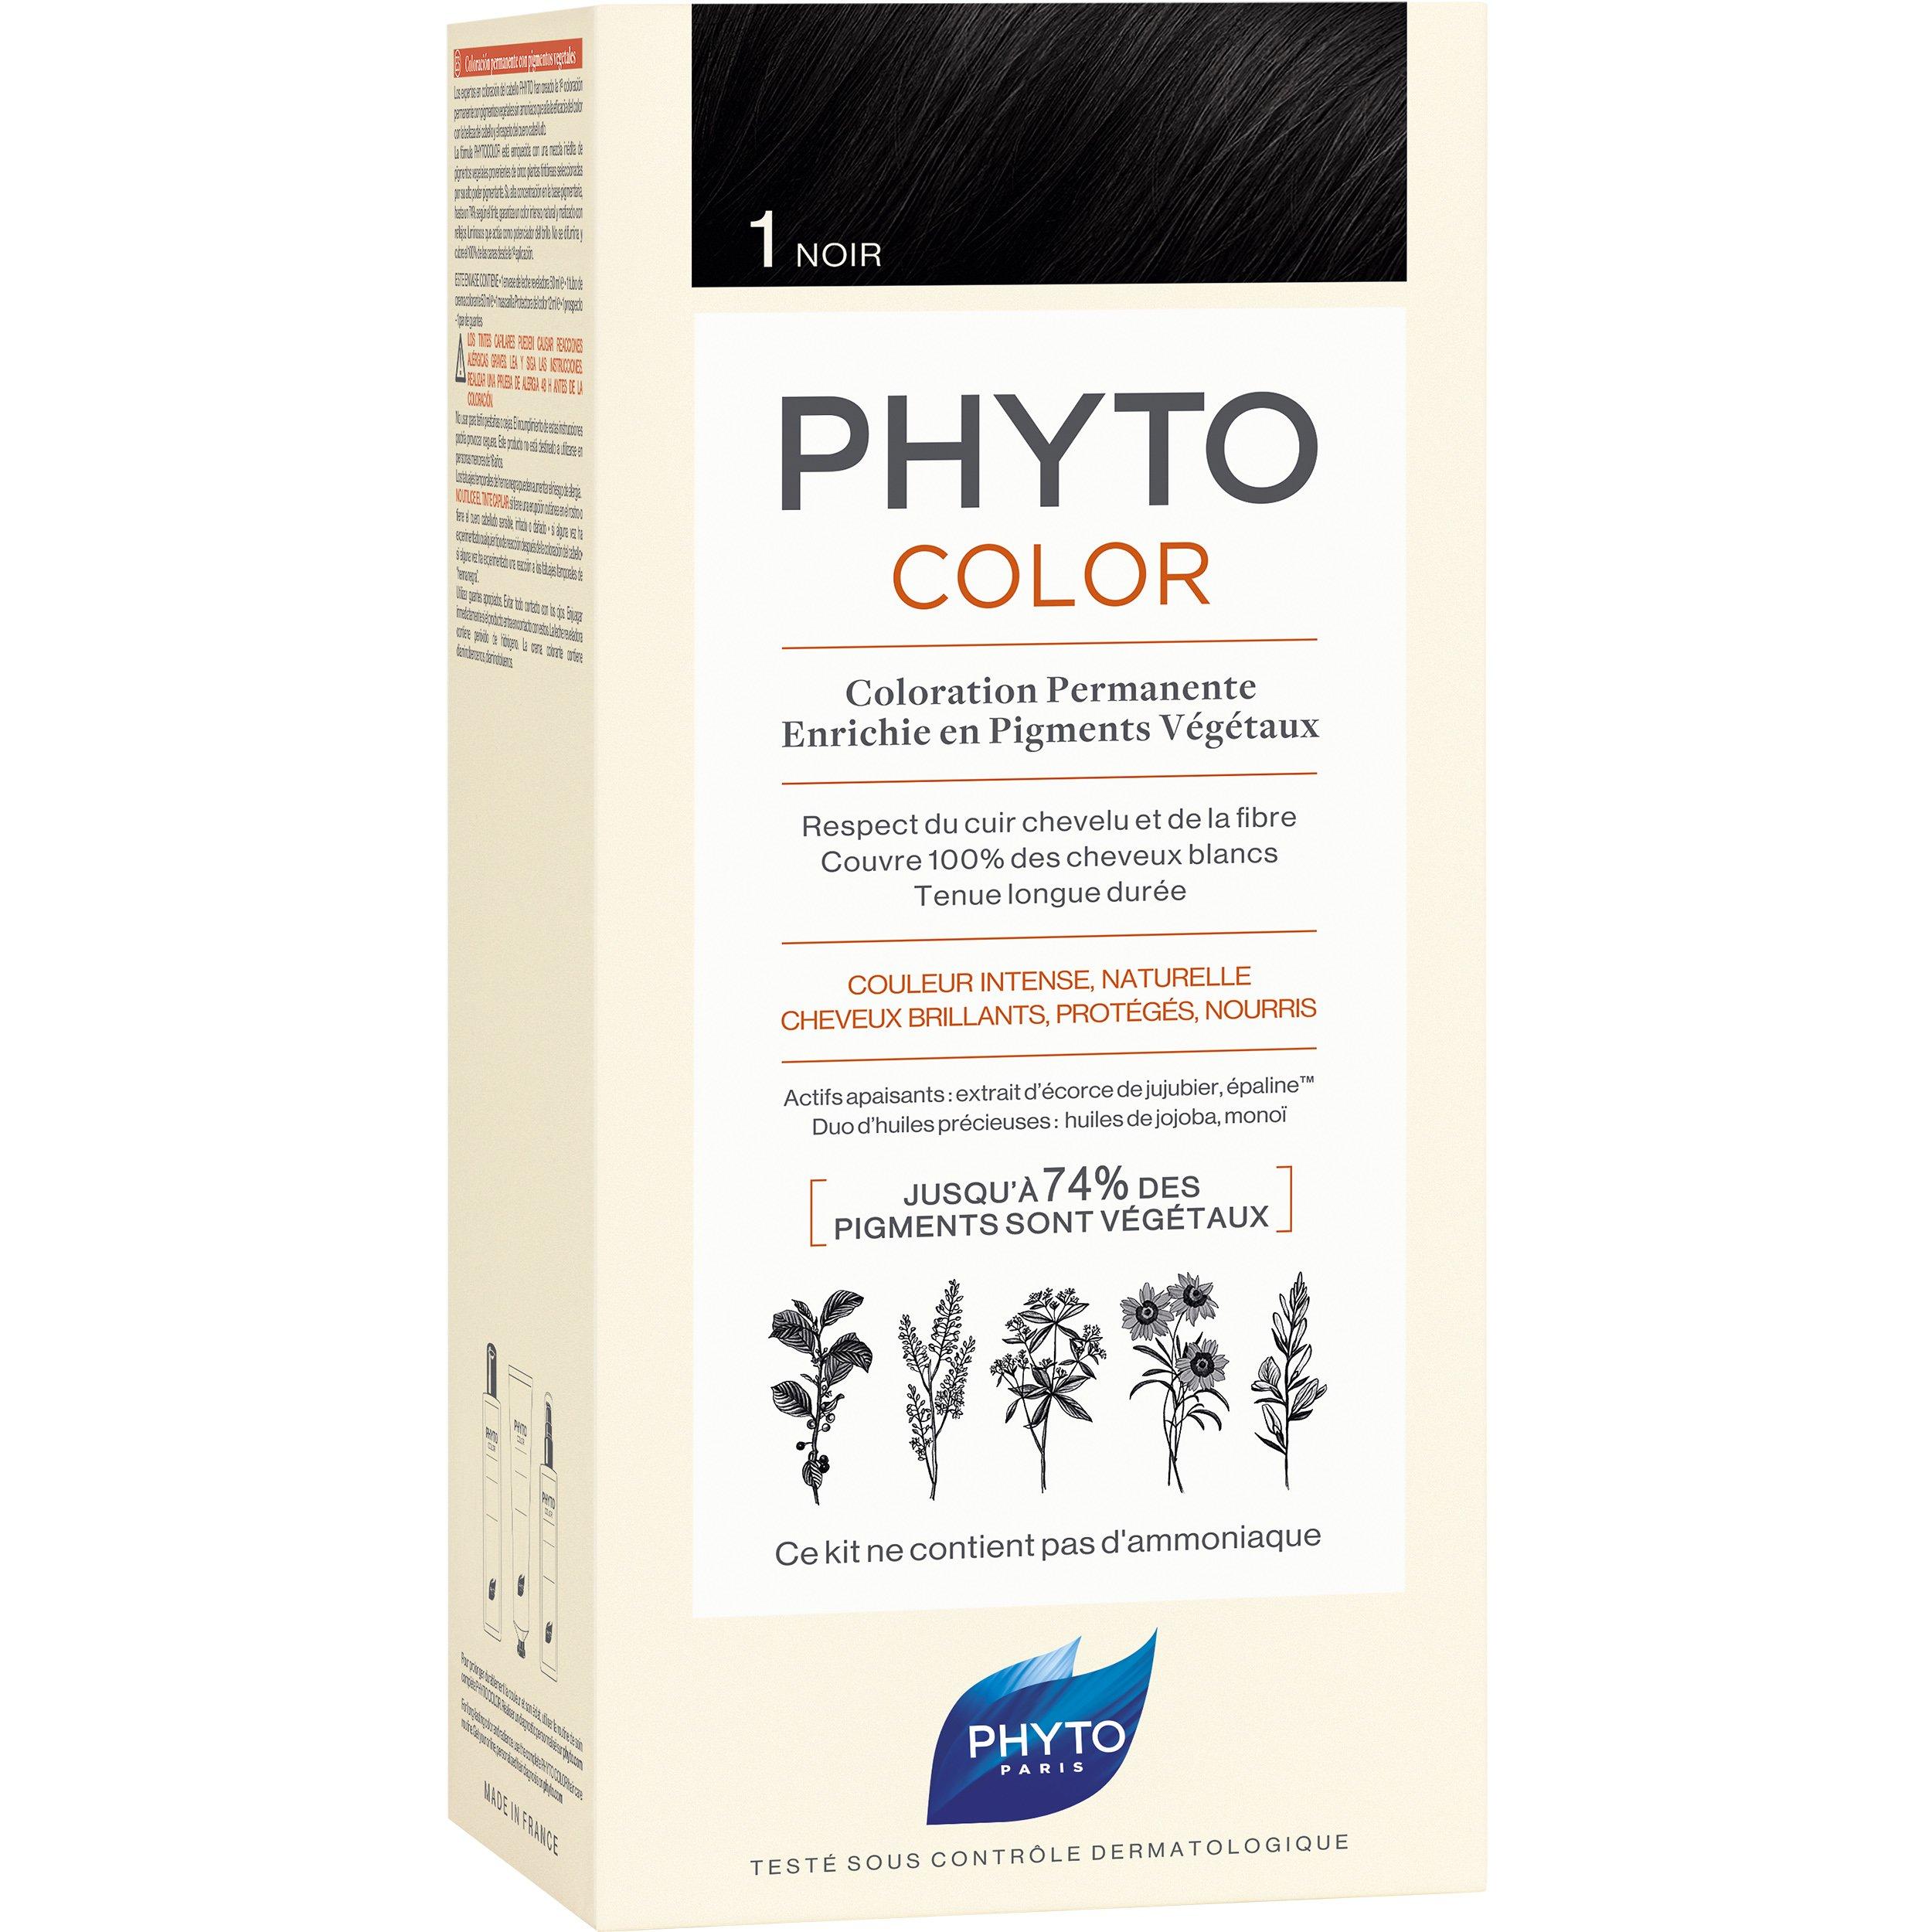 Phyto PhytoColor Coloration Permanente η No1 Μόνιμη Βαφή Μαλλιών Χωρίς Χρωστικές Ουσίες & Αμμωνία – 1 Μαύρο